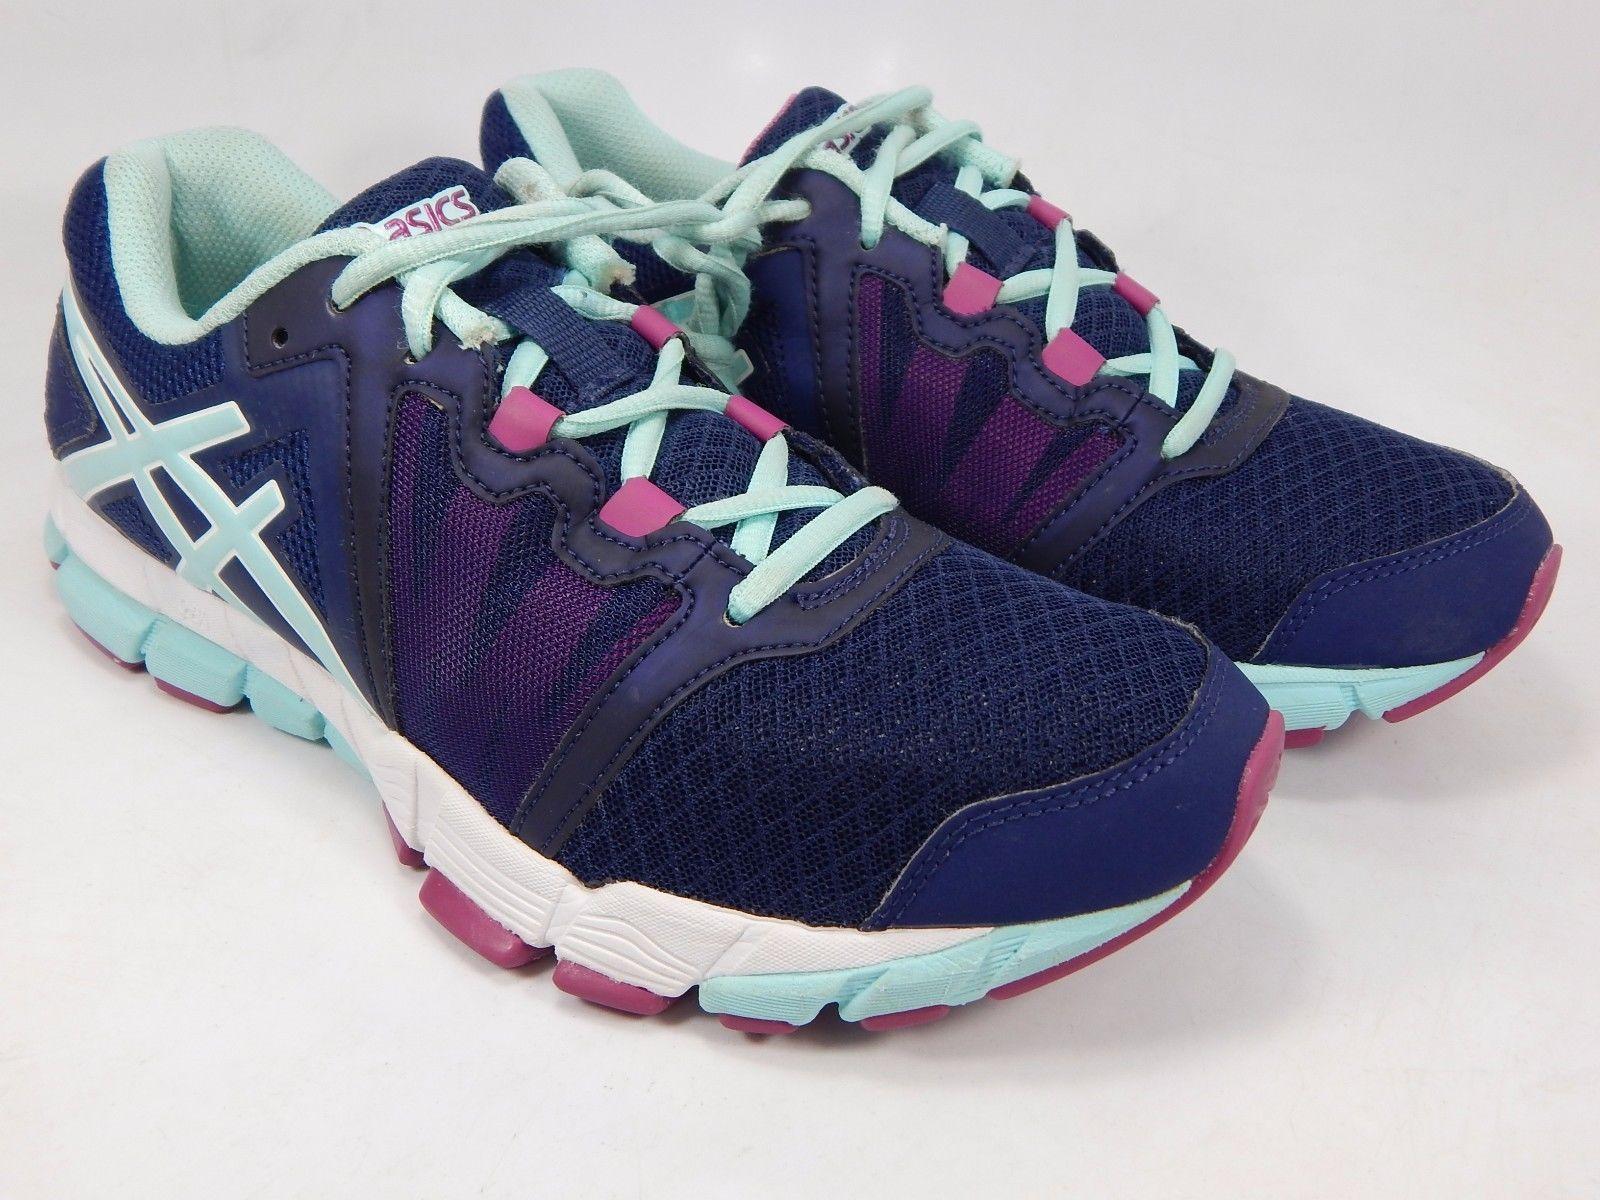 Asics Gel Craze TR Women's Running Shoes Size US 7.5 M (B) EU 39 Blue S383N